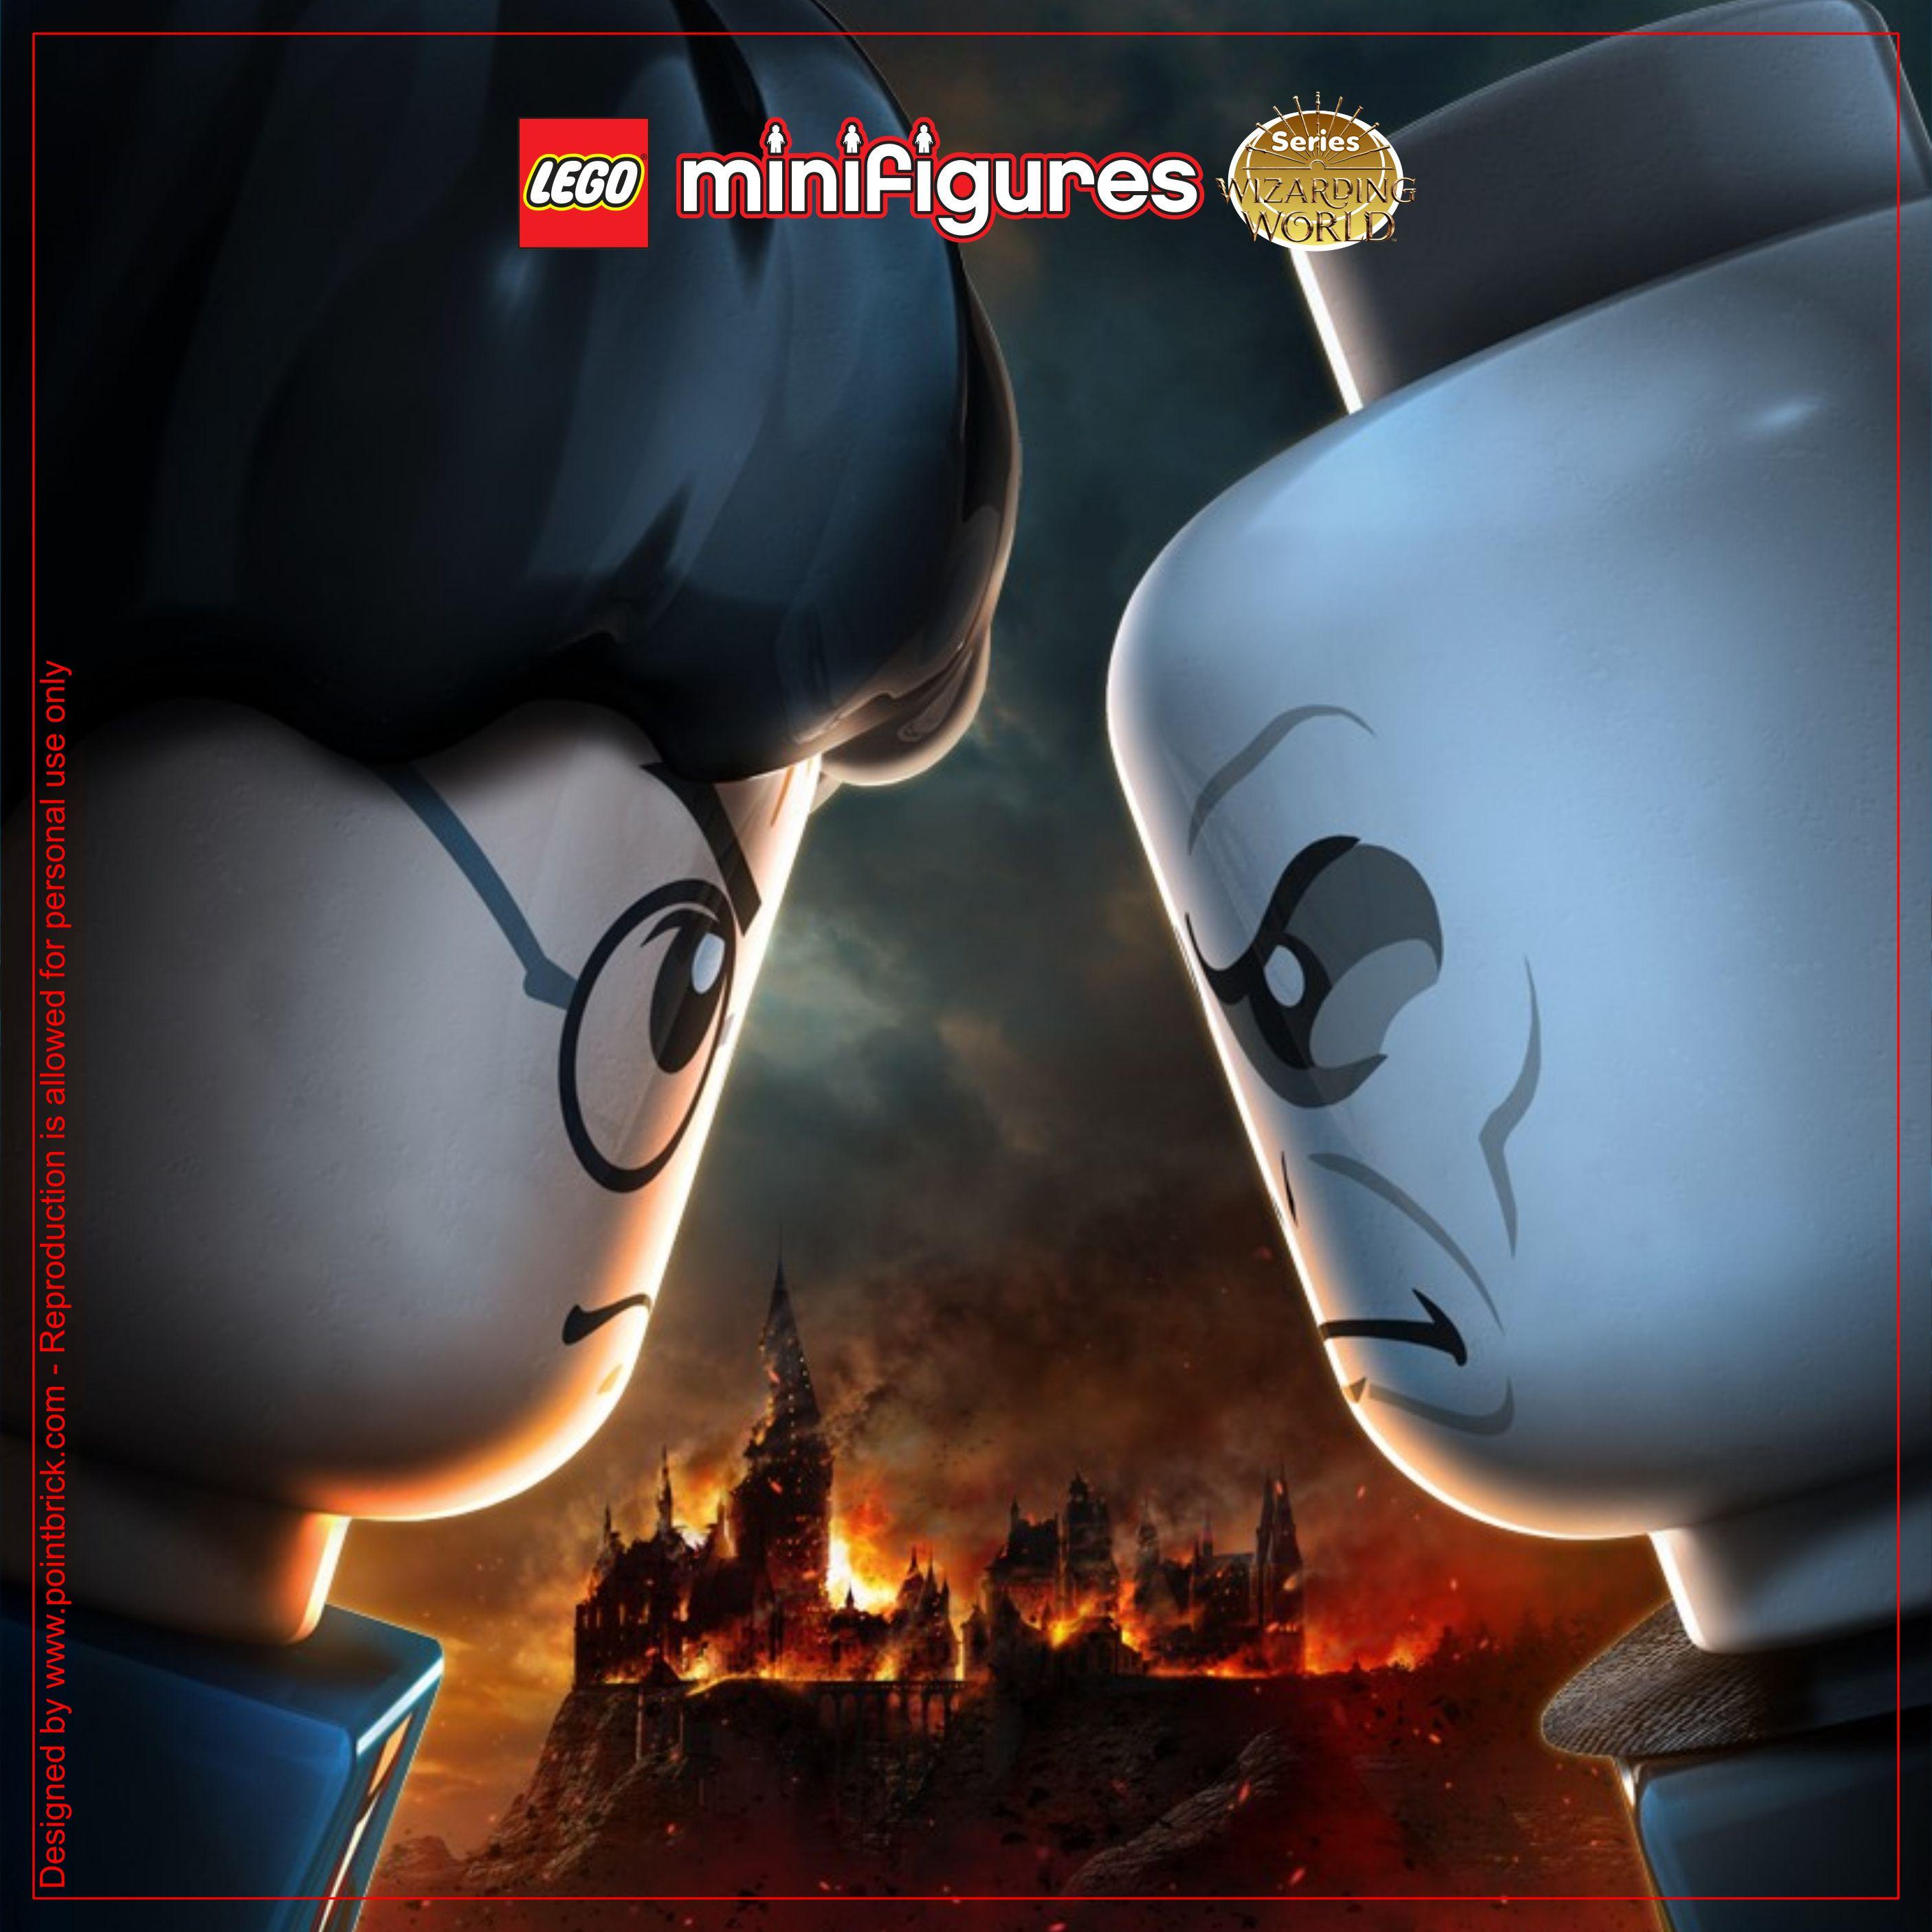 Lego Minifigures Display Sfondi Harry Potter Bastelideen Basteln Idee